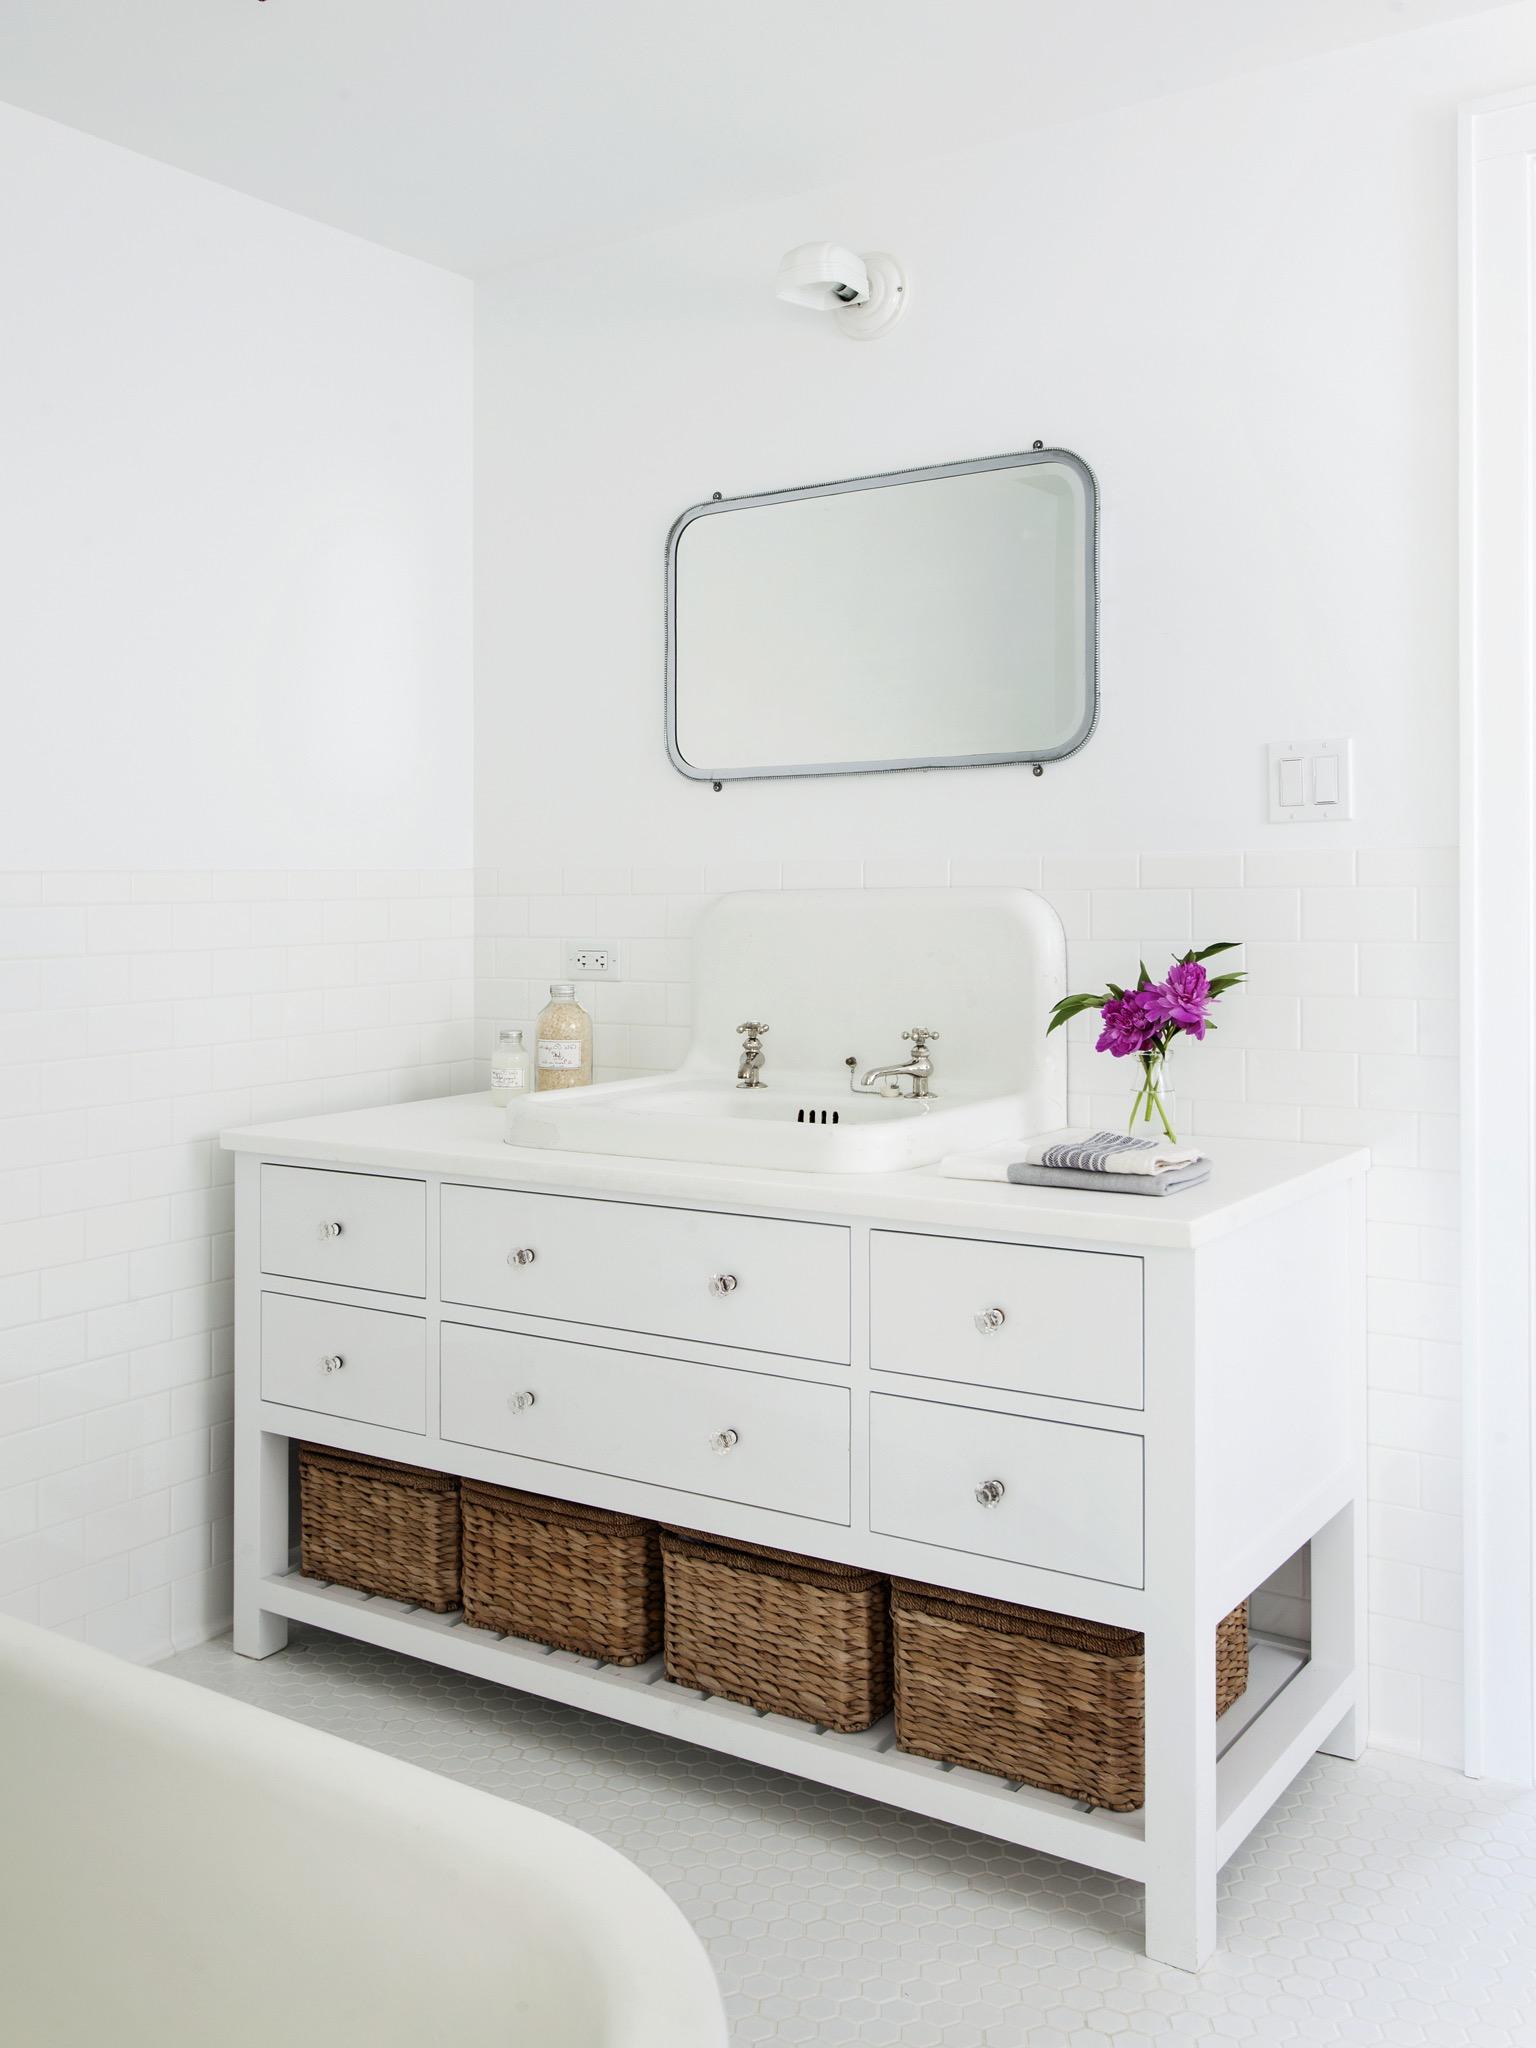 Minimalist White Bathroom Vanity Storage (View 17 of 20)